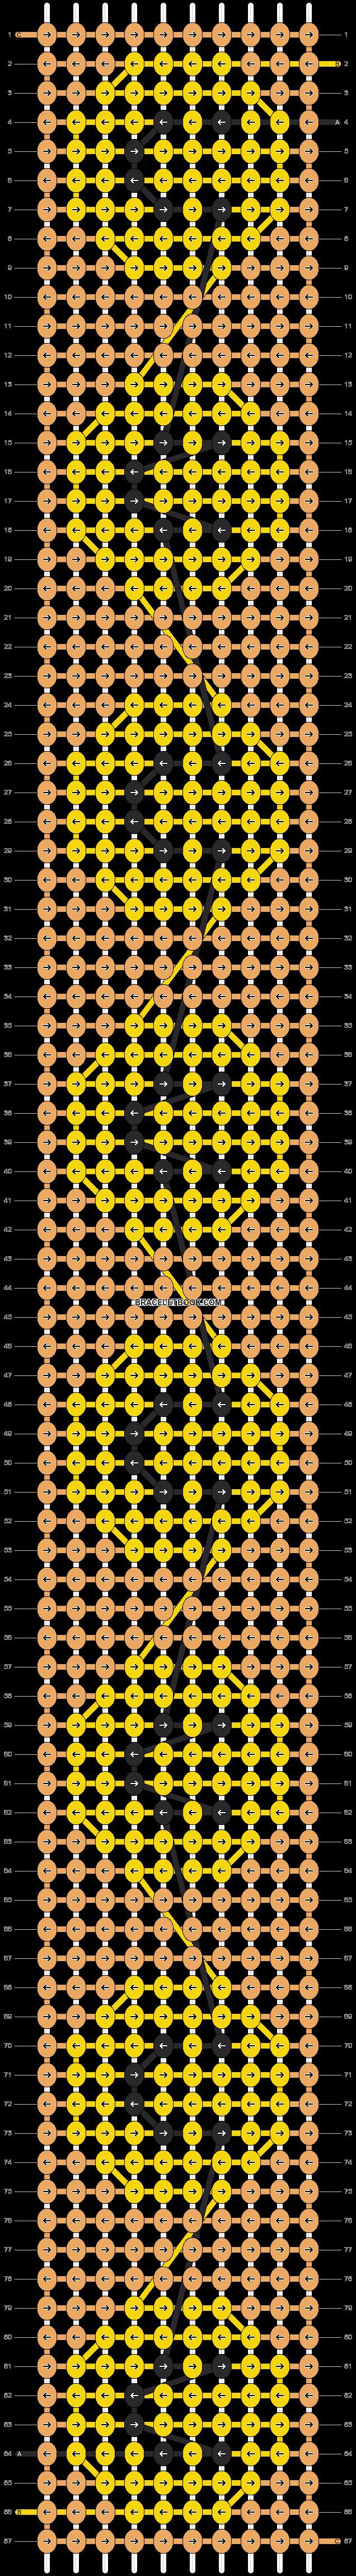 Alpha pattern #86446 variation #156425 pattern